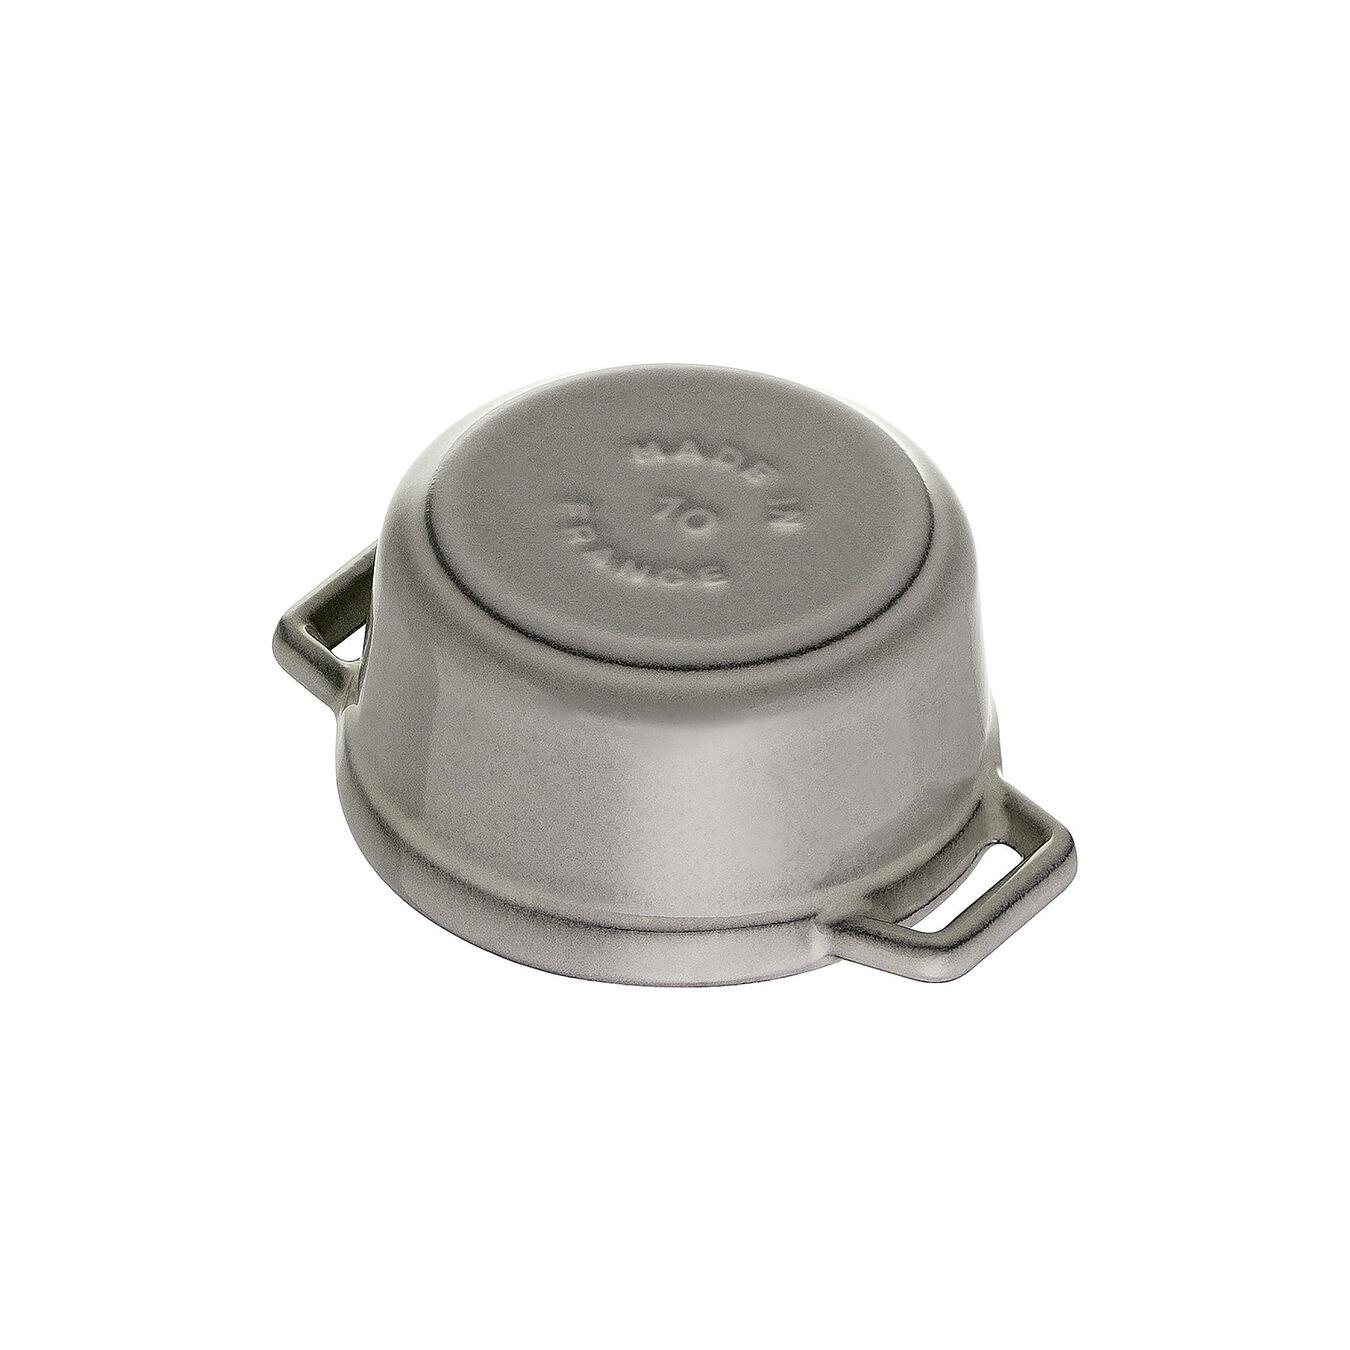 250 ml Cast iron round Mini Cocotte, Grey,,large 4